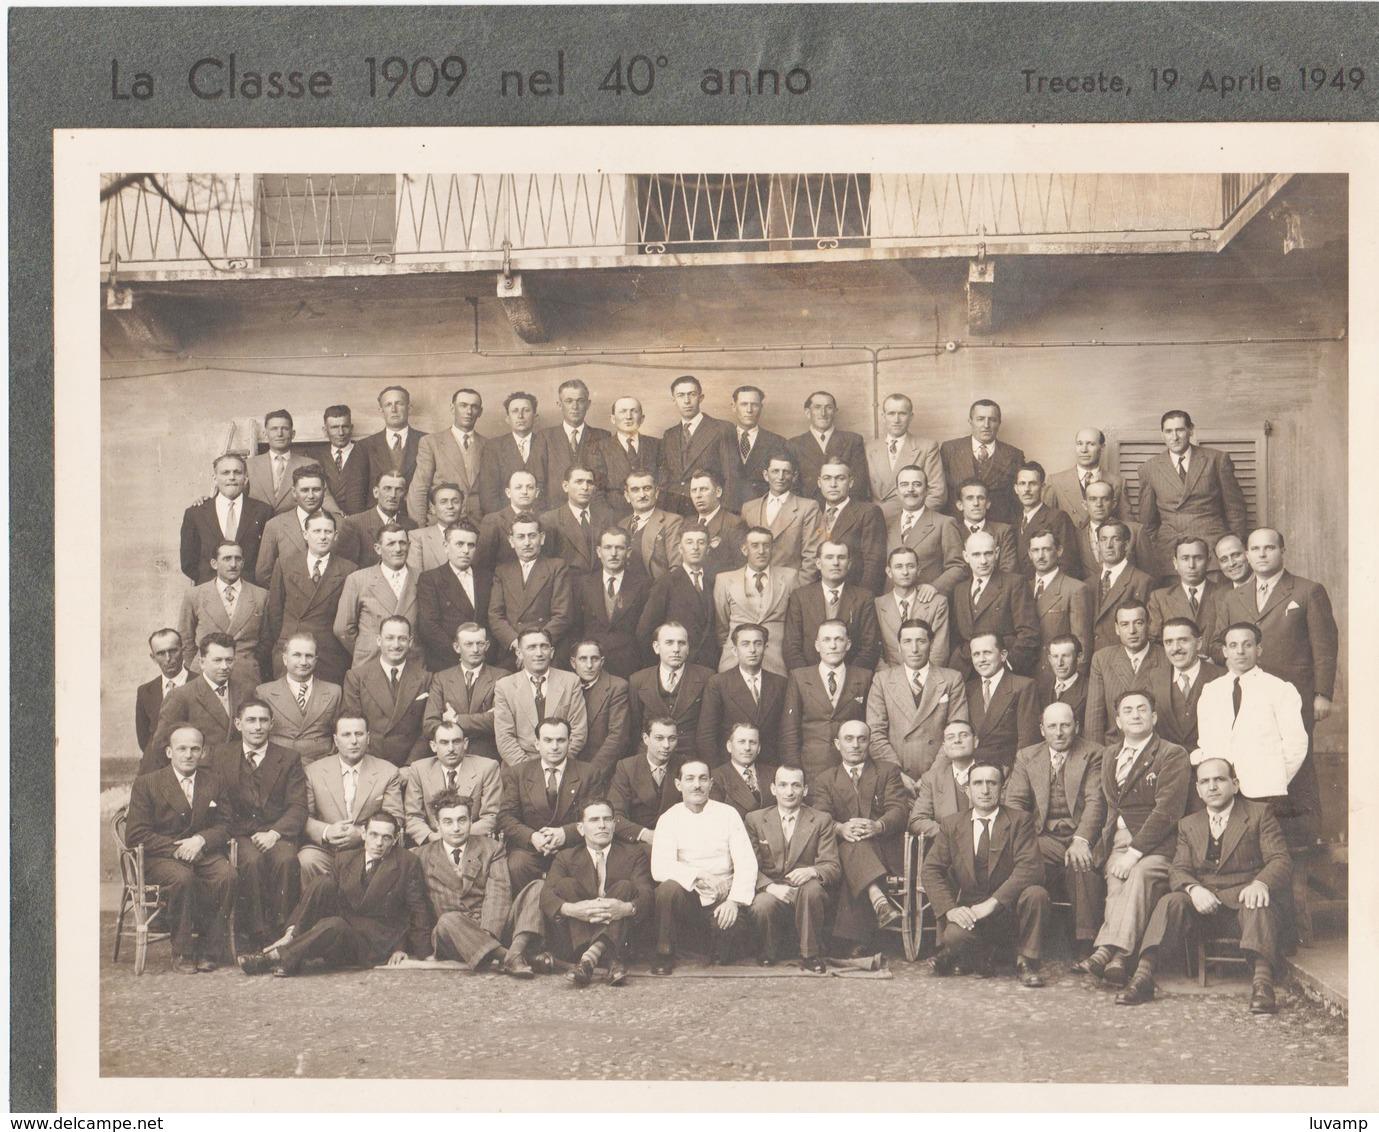 TRECATE (NOVARA) -FOTO ORIGINALE COSCRITTI 1909 (50119) - Persone Identificate